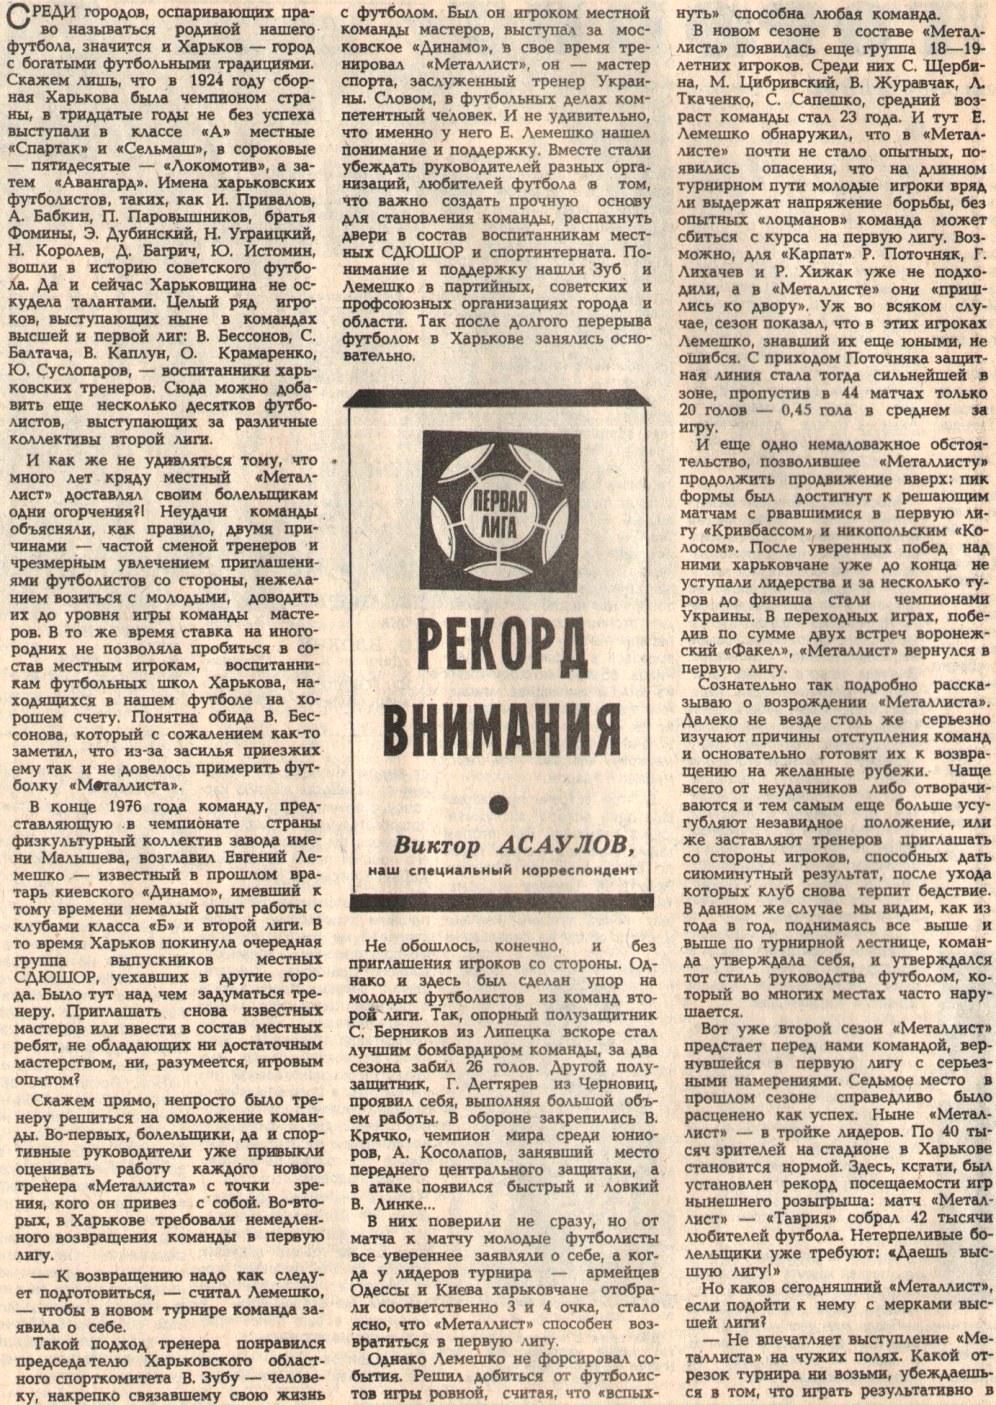 [Изображение: 1980_Reckord-vnimaniya_01.jpg]